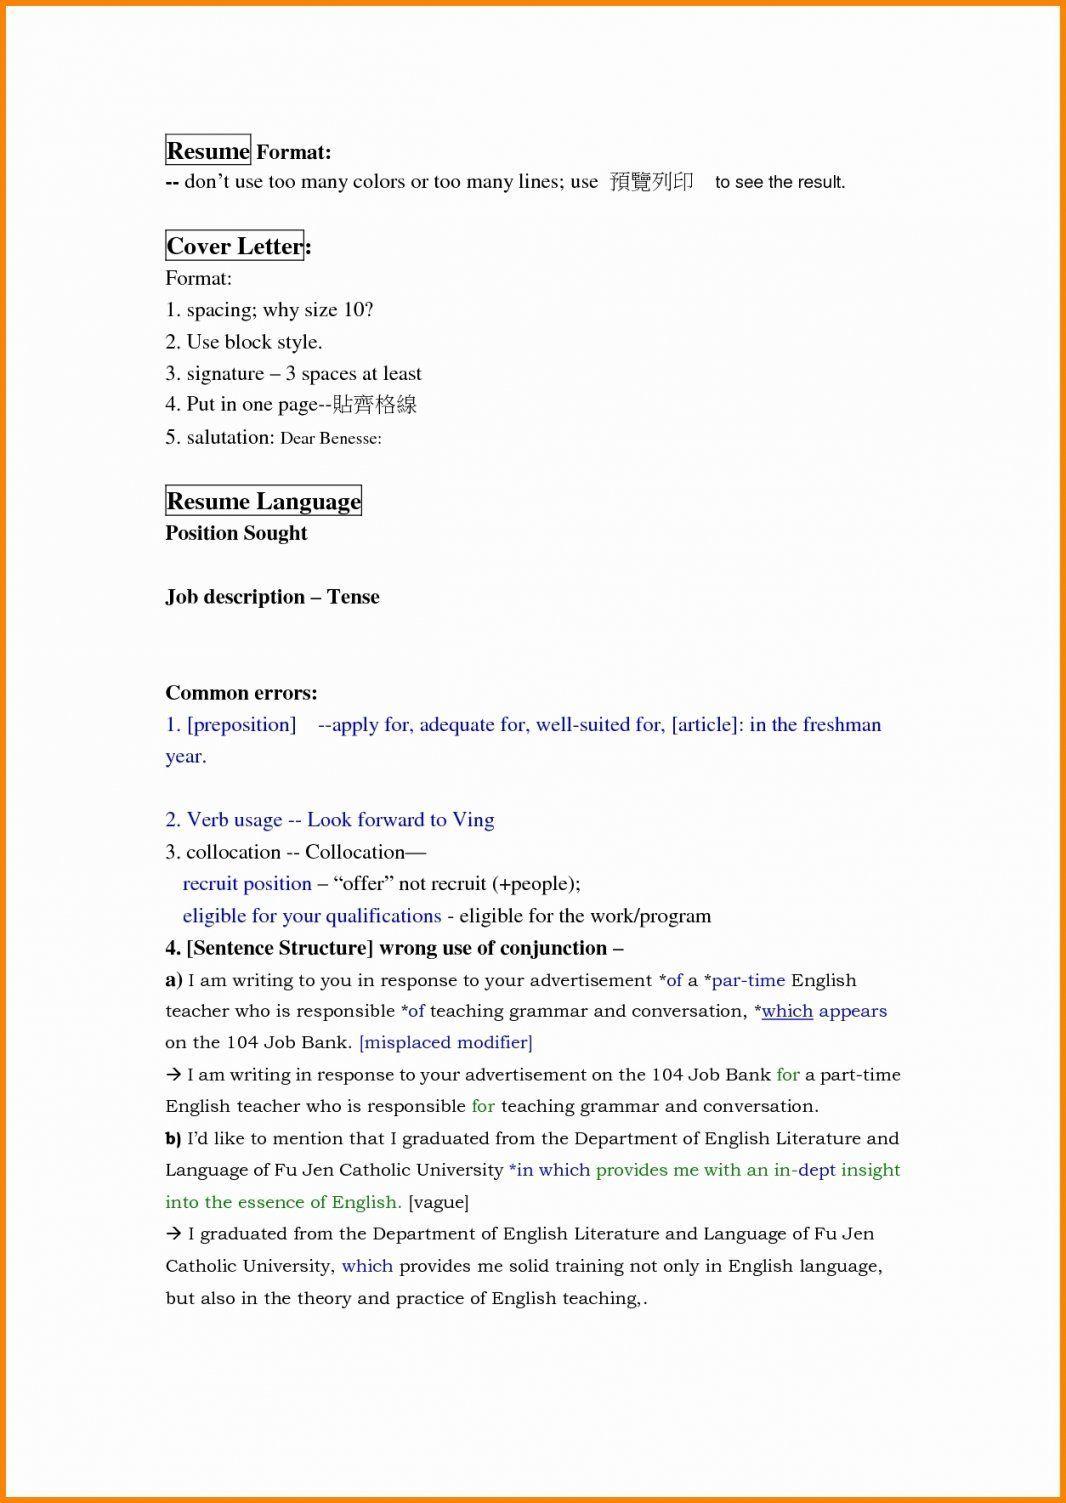 Resume Format Spacing Resumeformat Resume Format Resume